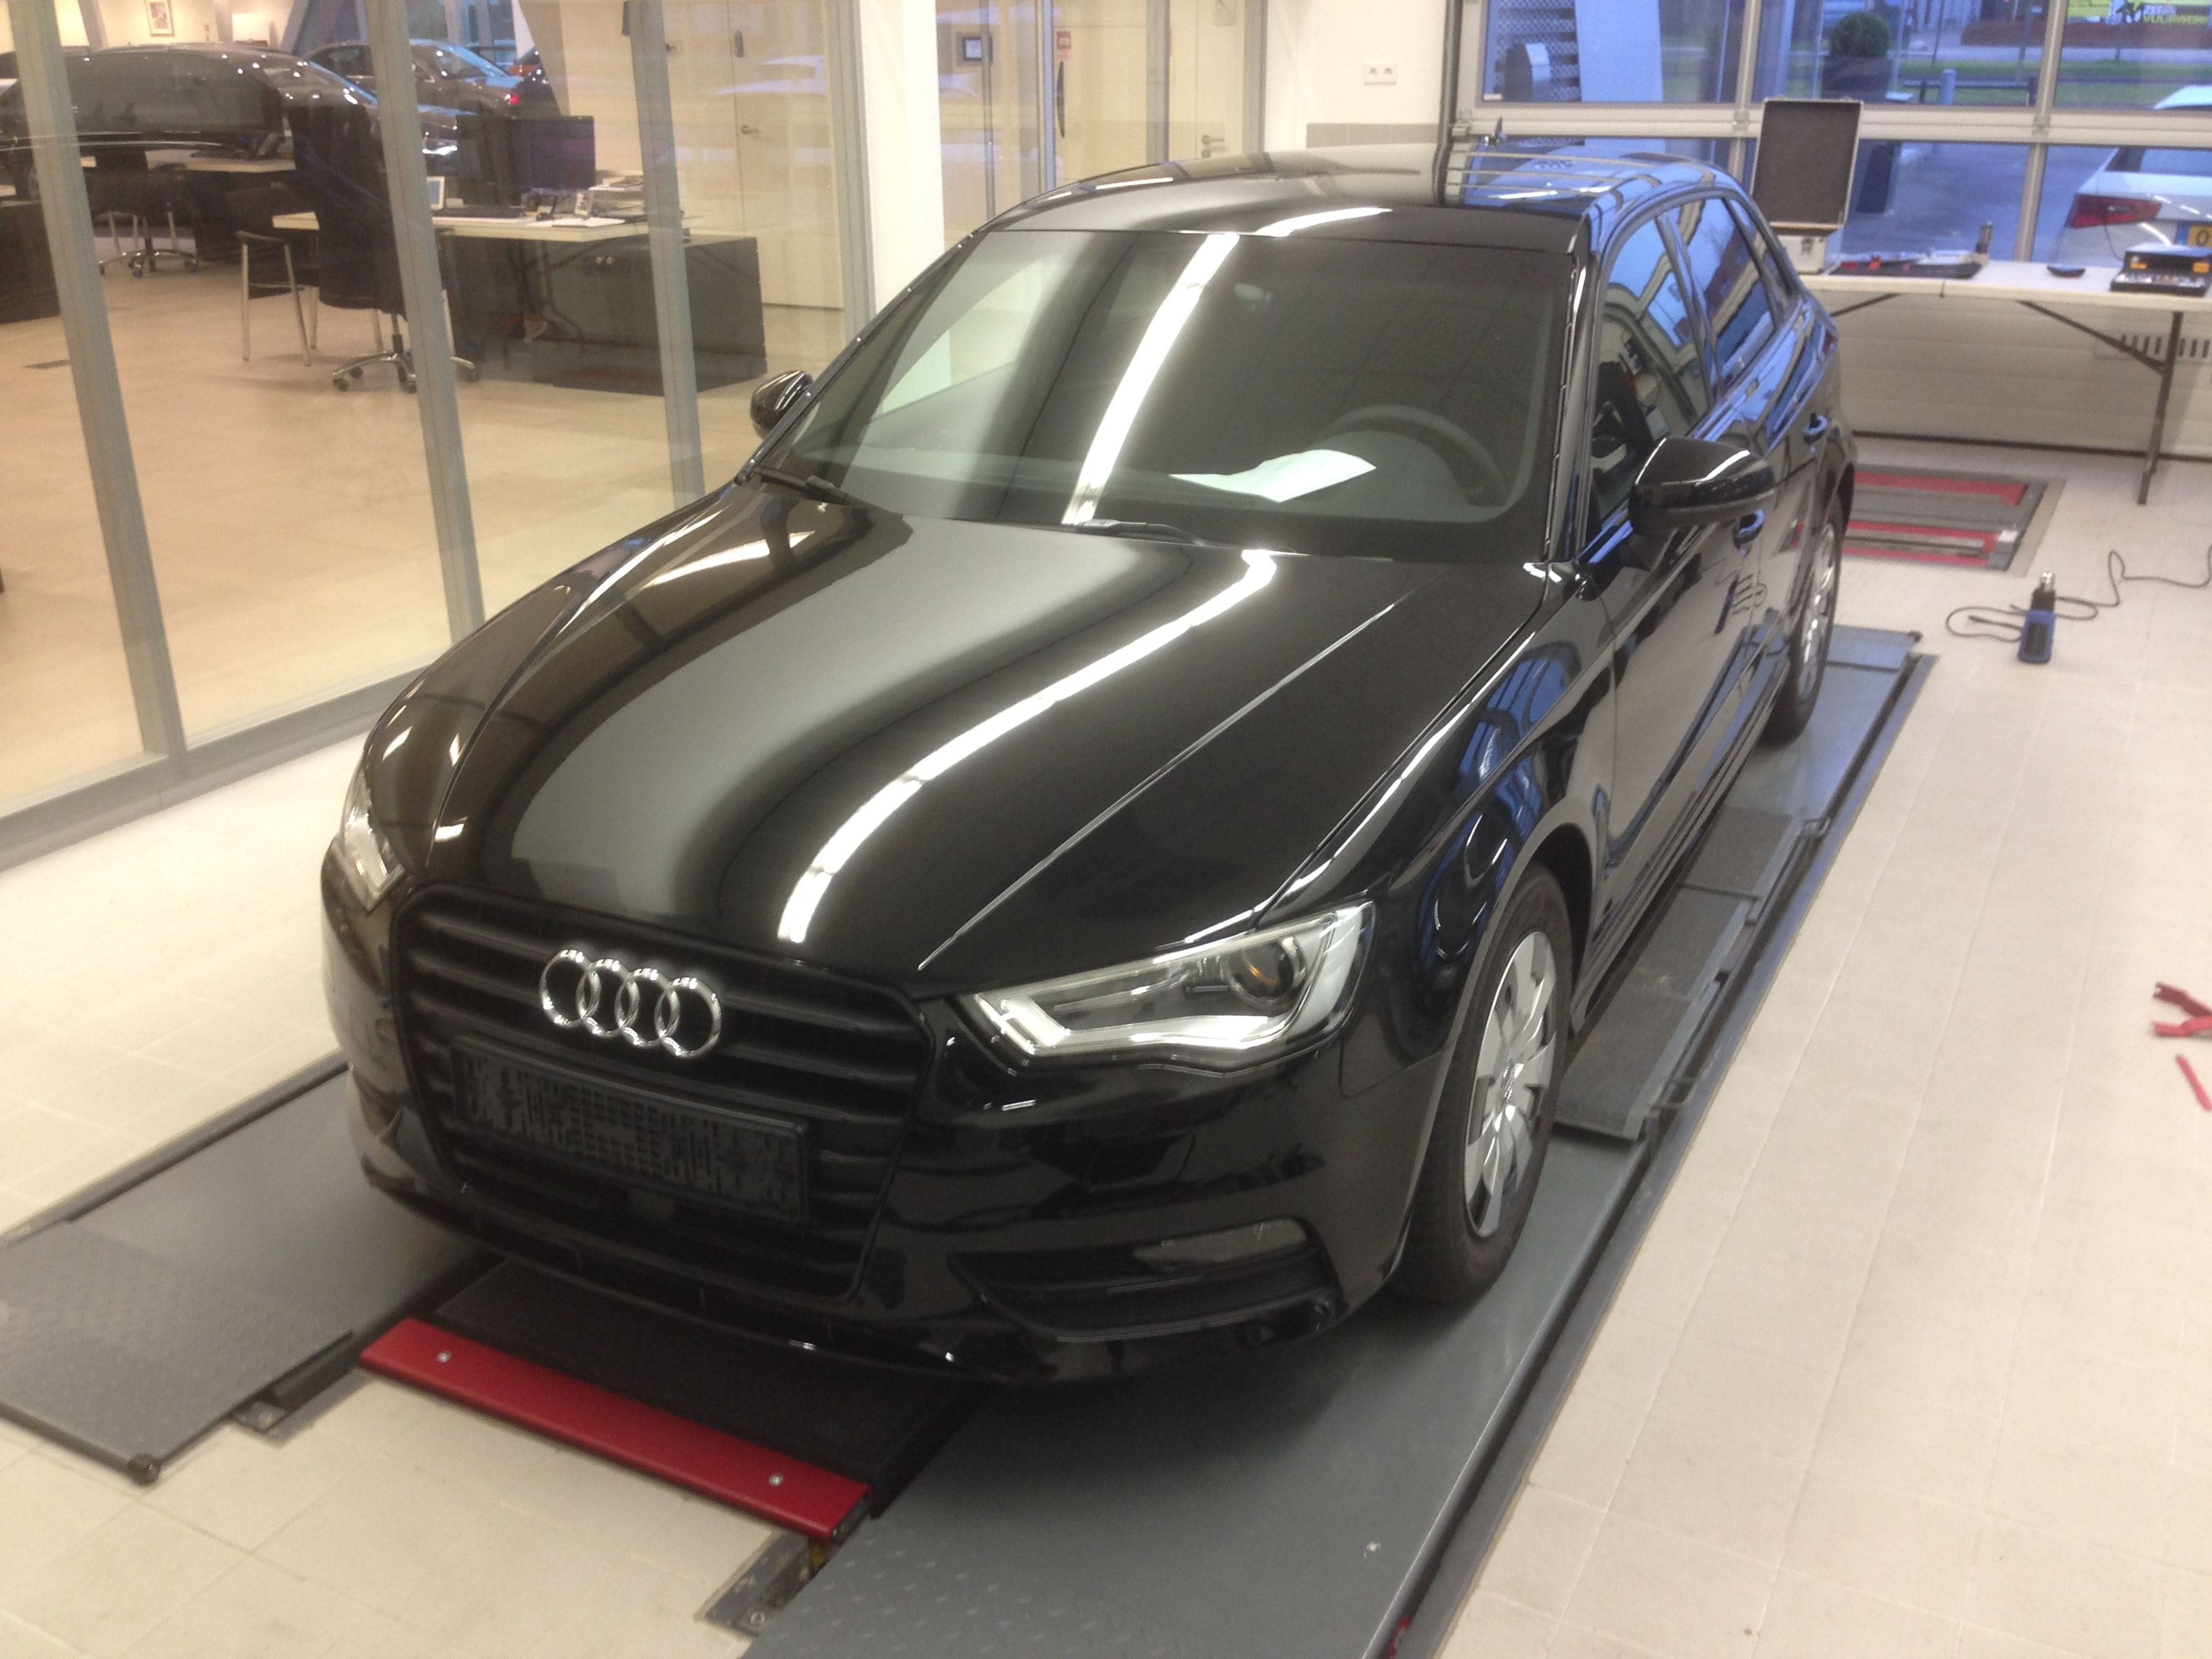 Audi A3 2014 met Mat Zwarte Wrap, Carwrapping door Wrapmyride.nu Foto-nr:4459, ©2021